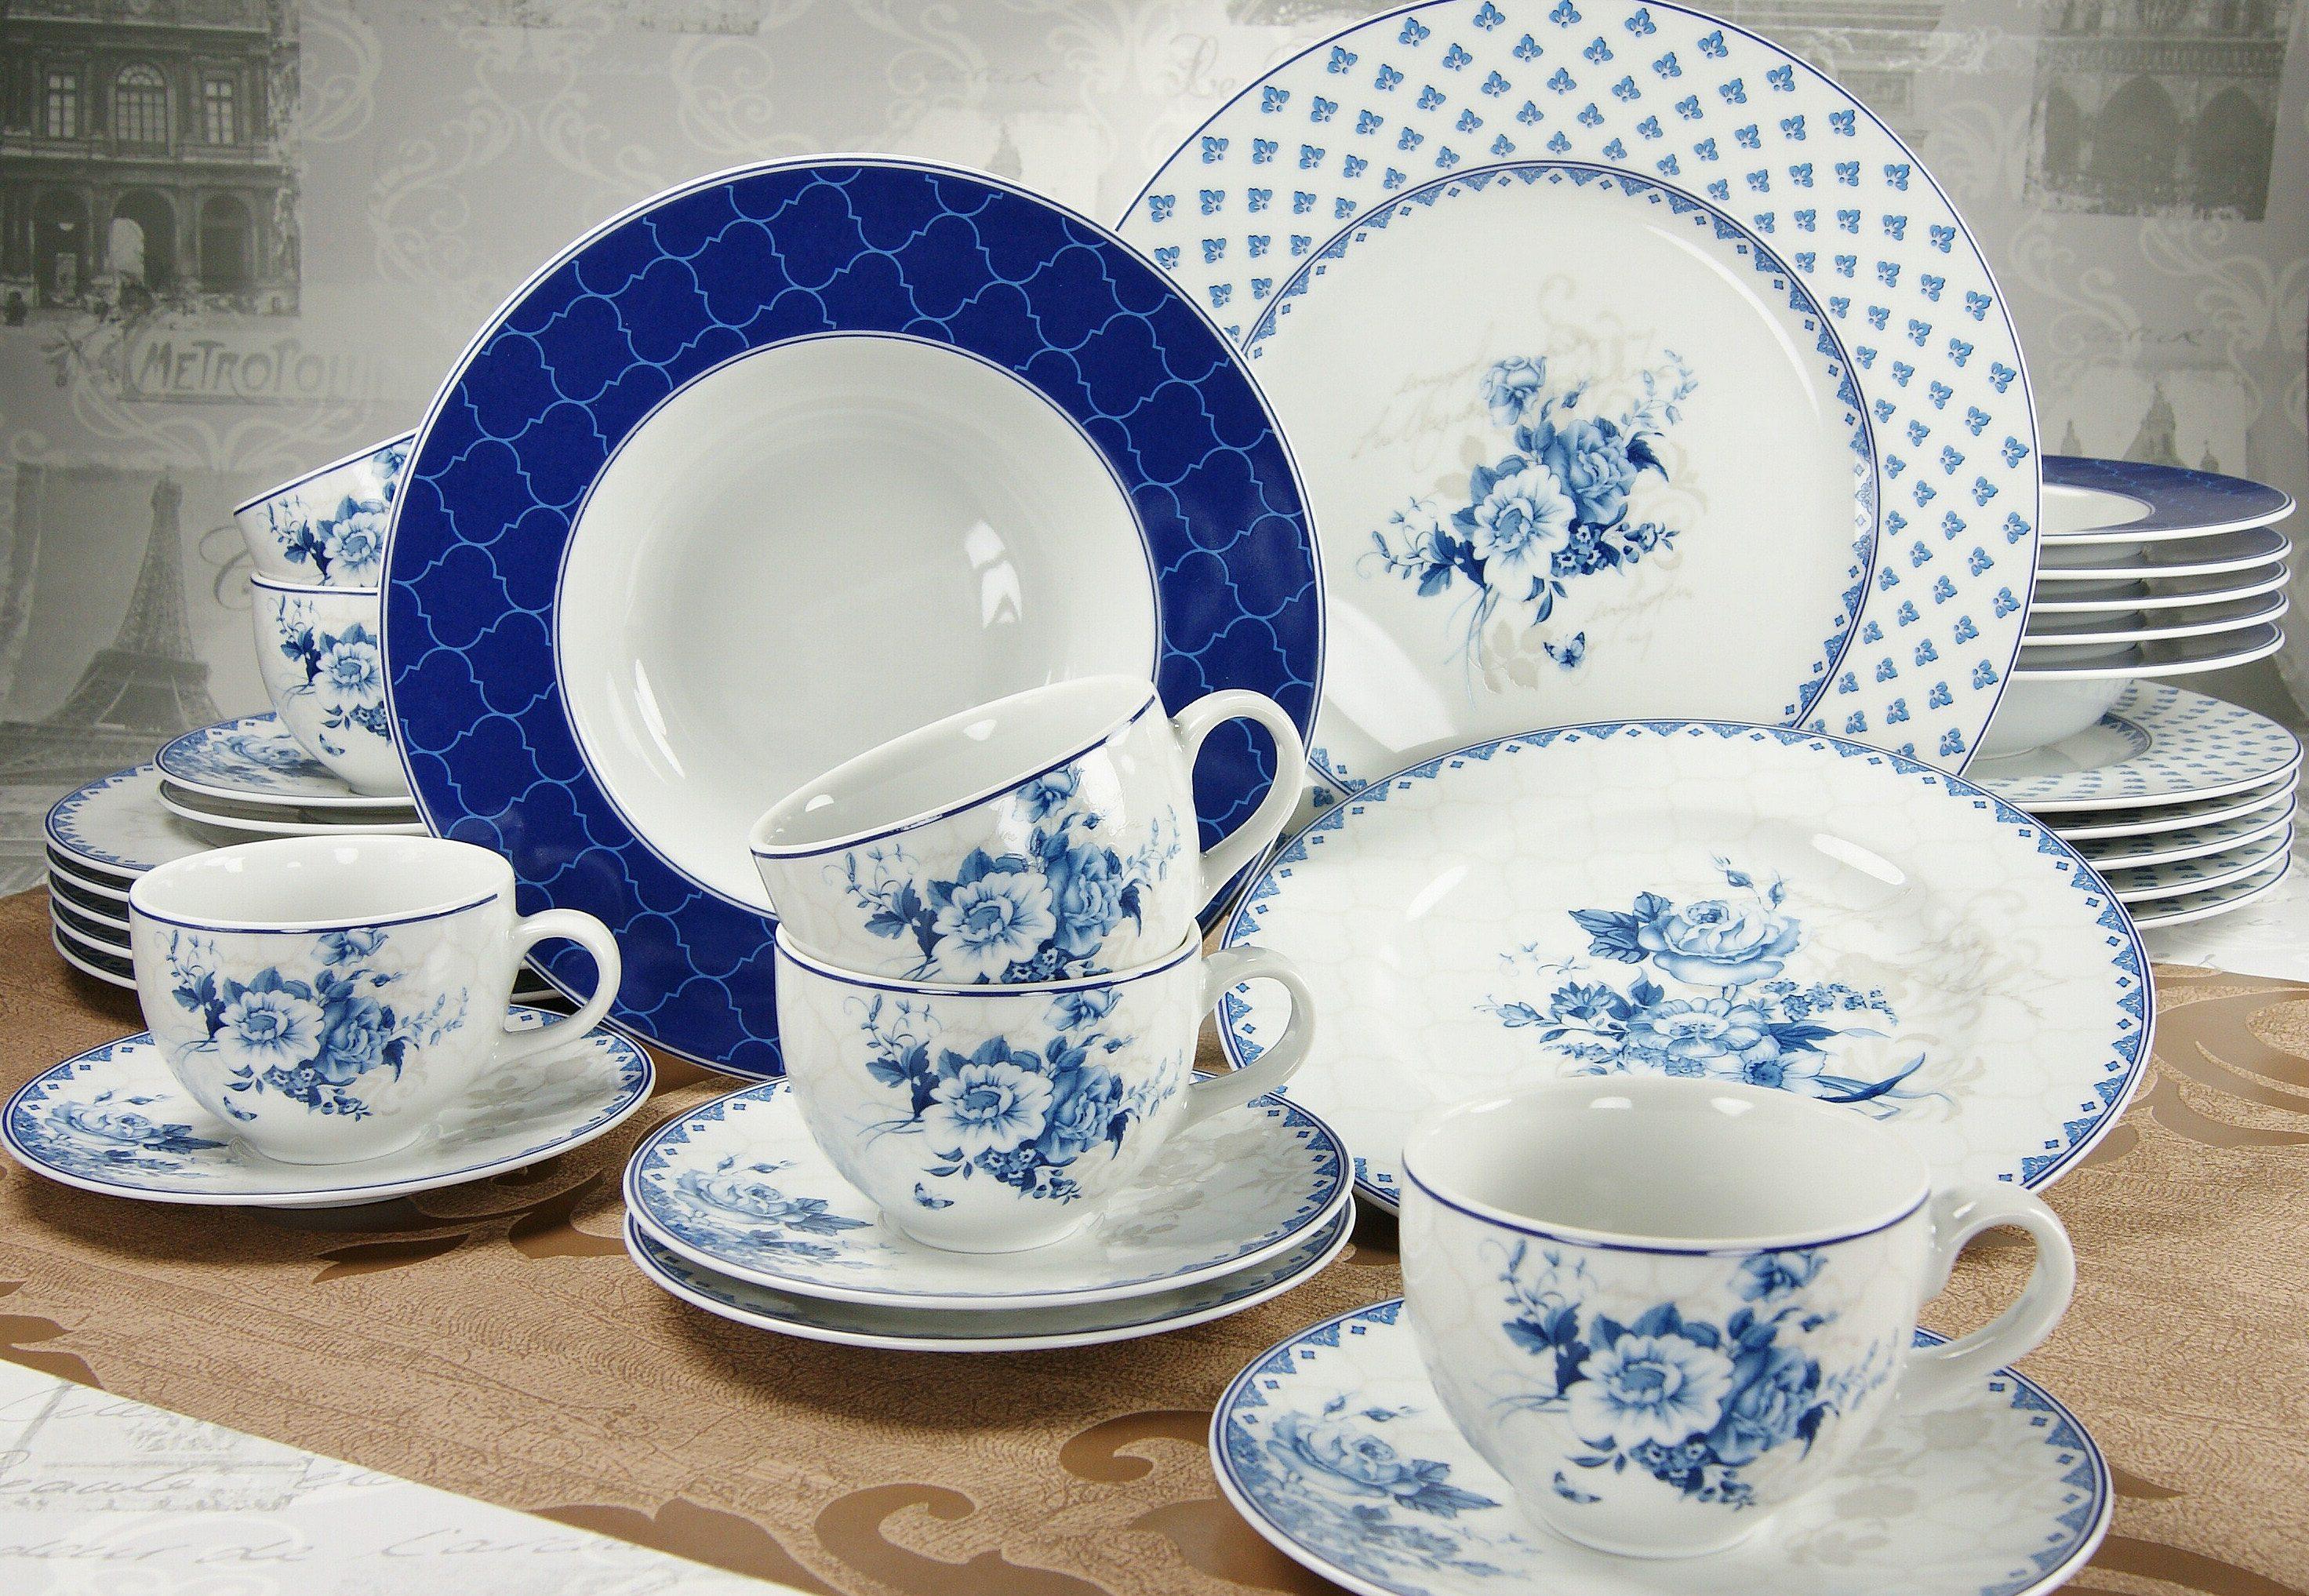 Porzellanserie, »Amelia Blue Dream«, CreaTable